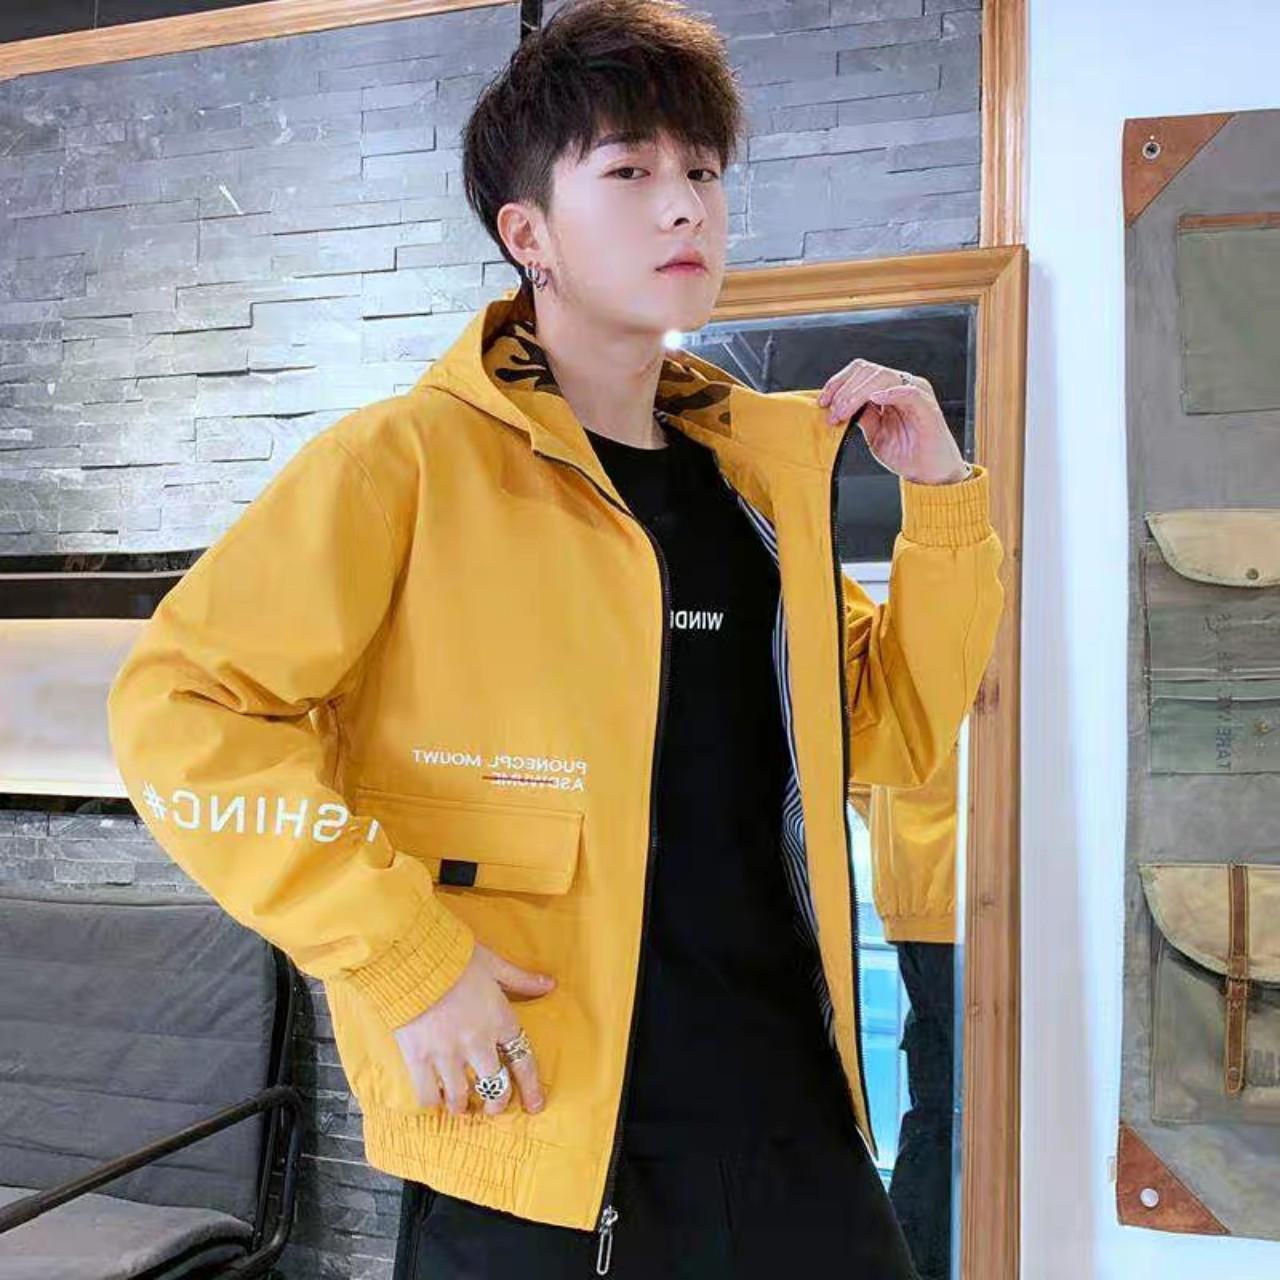 áo chống nắng nam vải kaki chống tia UV cao cấp 2019